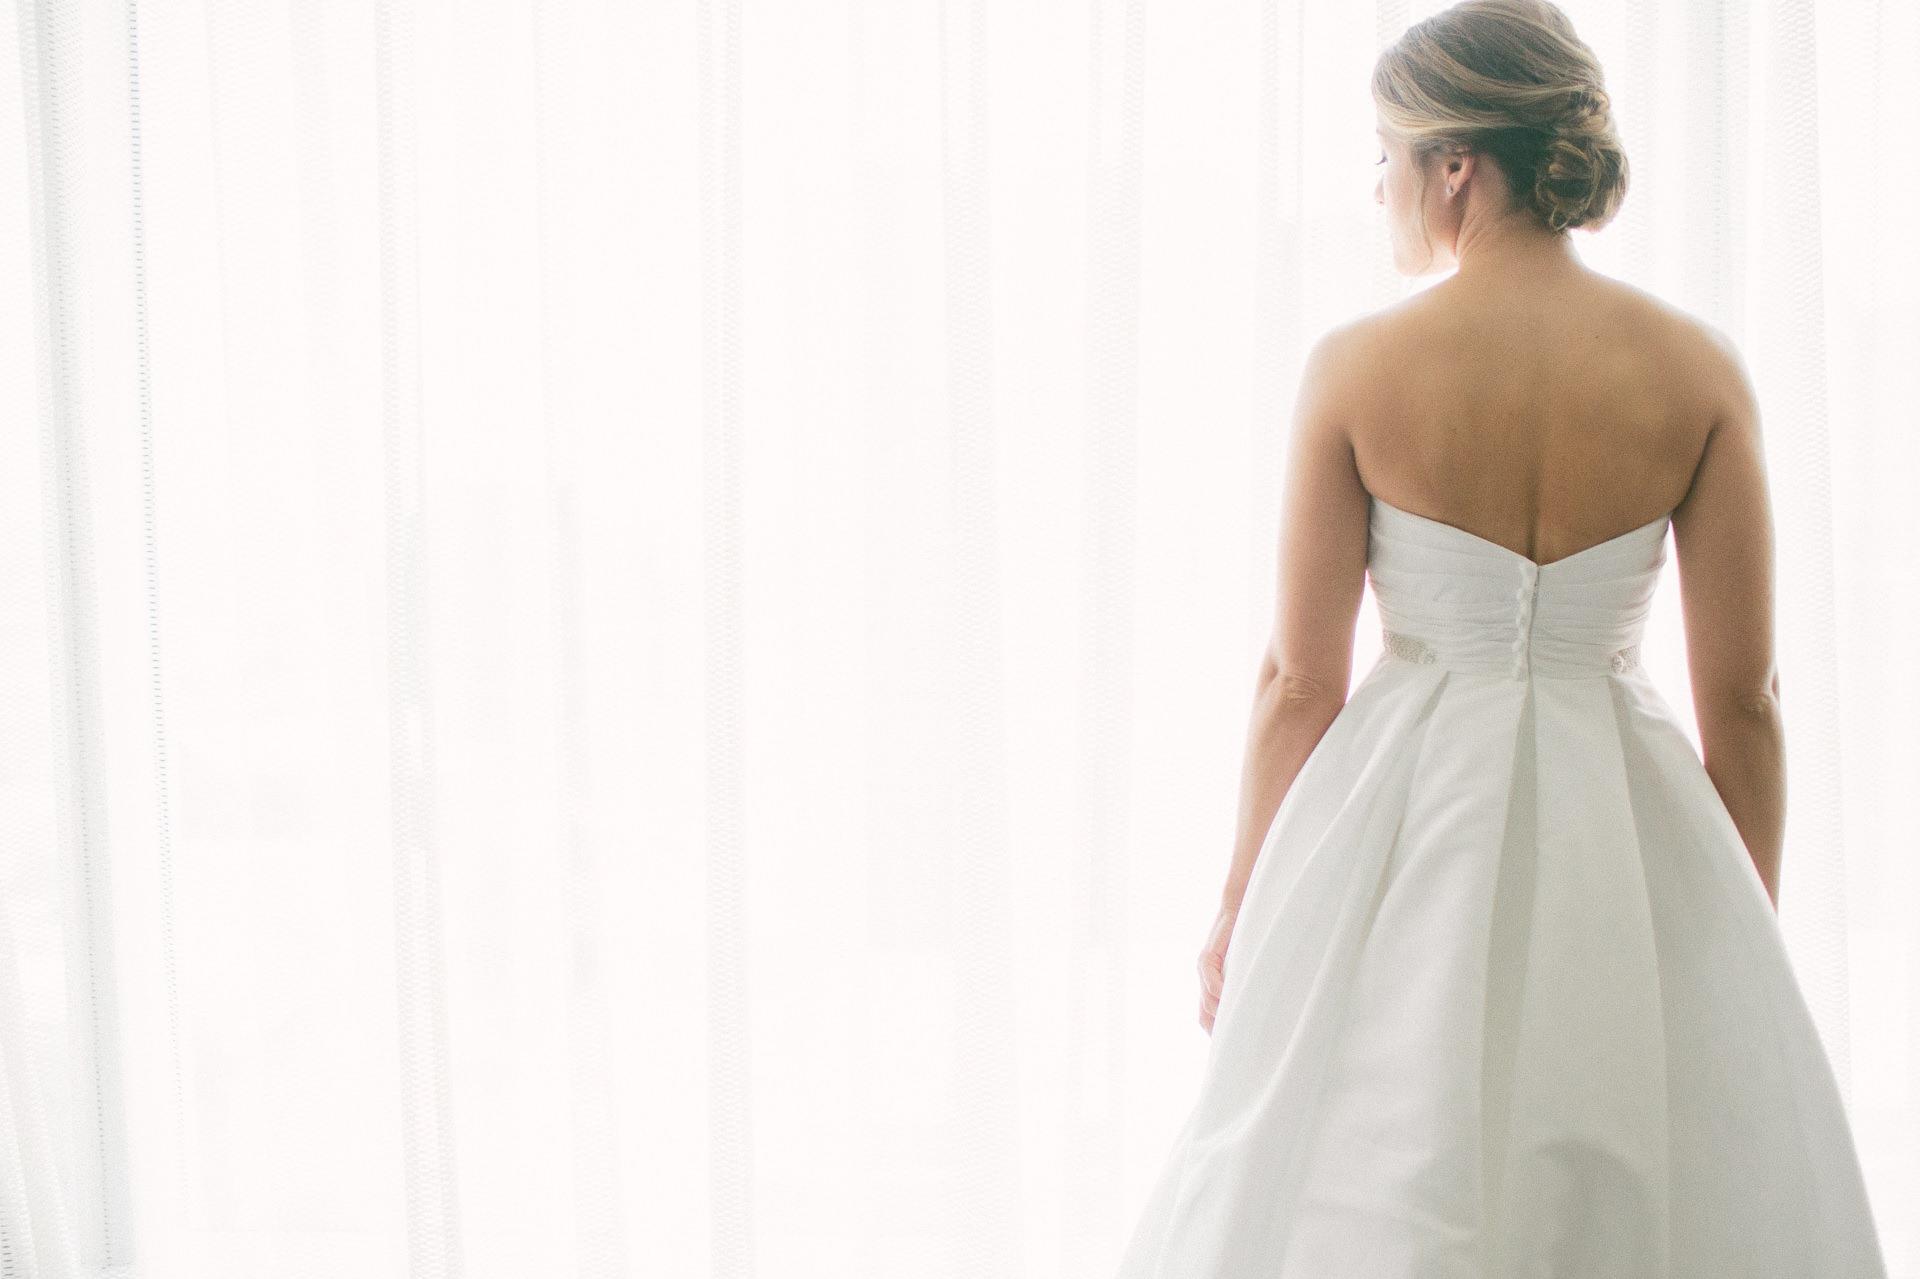 Dowtown Hilton Cleveland Wedding Photographer 1 21.jpg